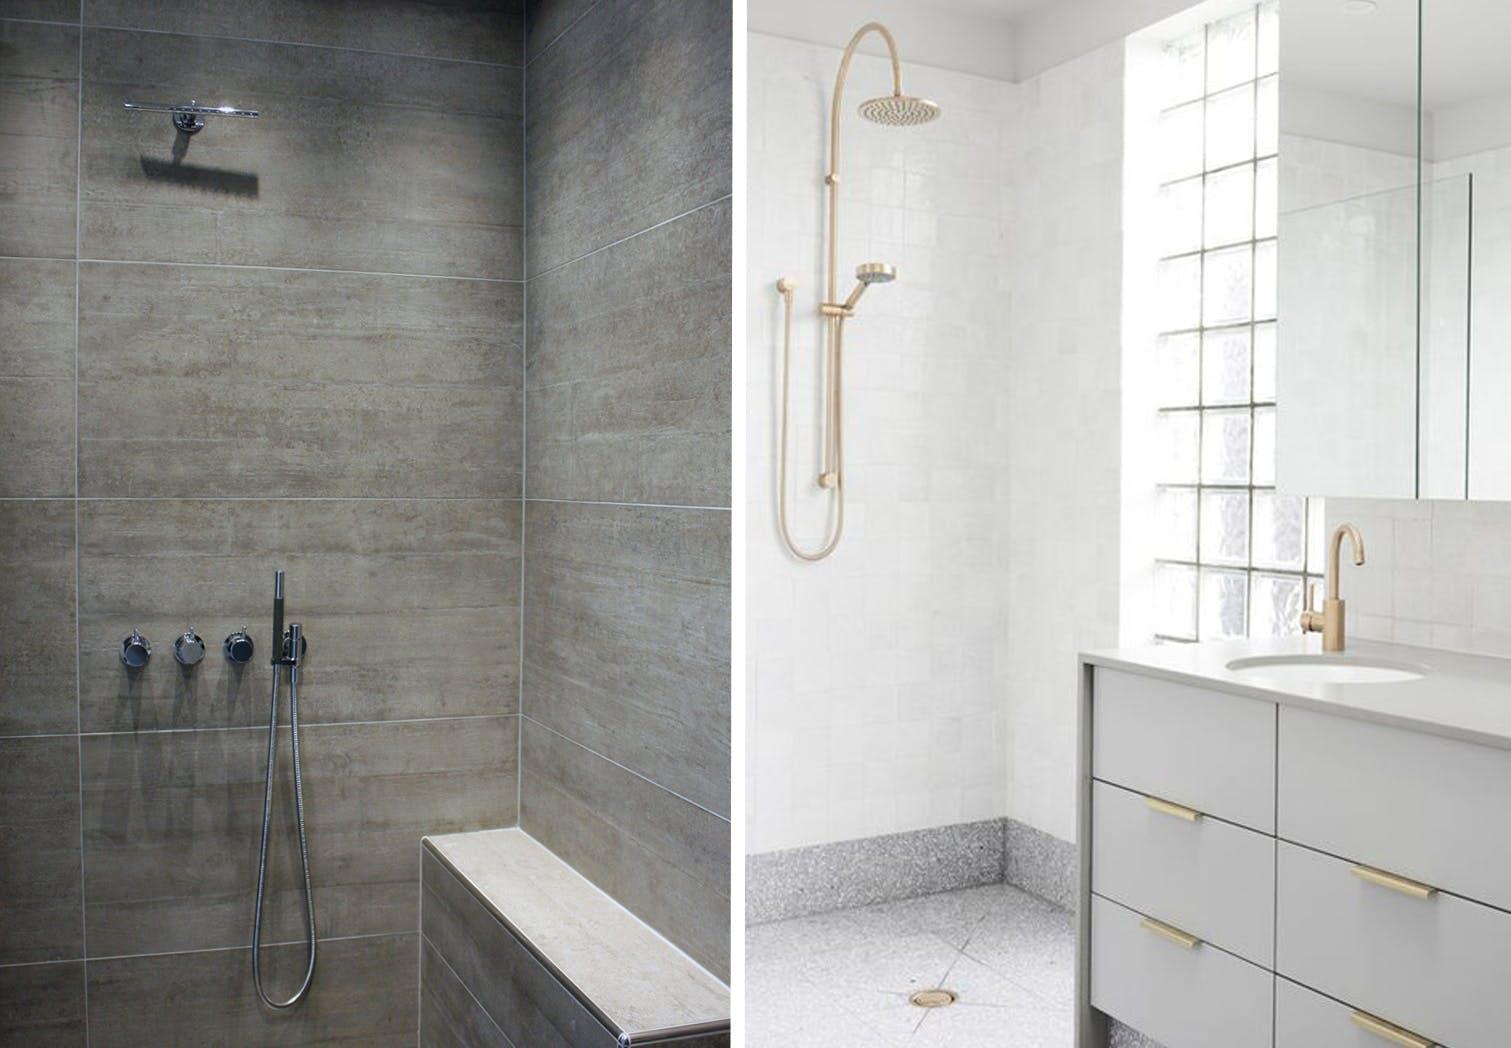 badeværelse flisebadeværelse badeværelse gulv indretning